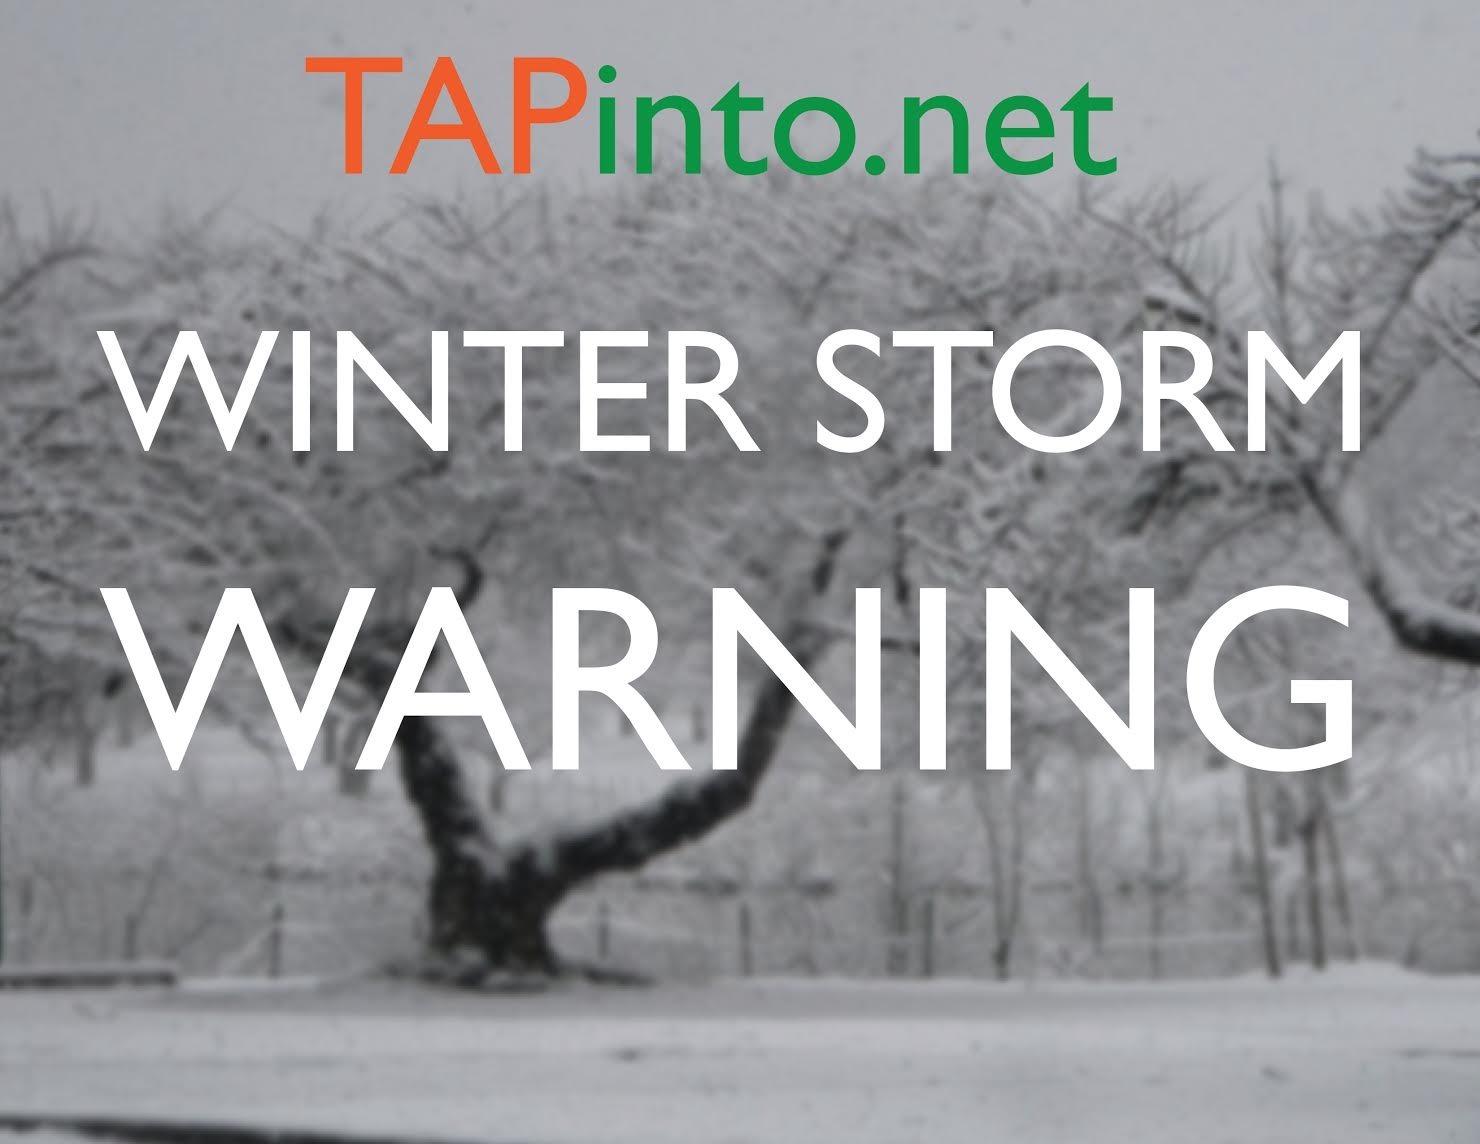 98a4a97b0188291742db_Winter_Storm_Warning_-_TAP_graphic.jpg